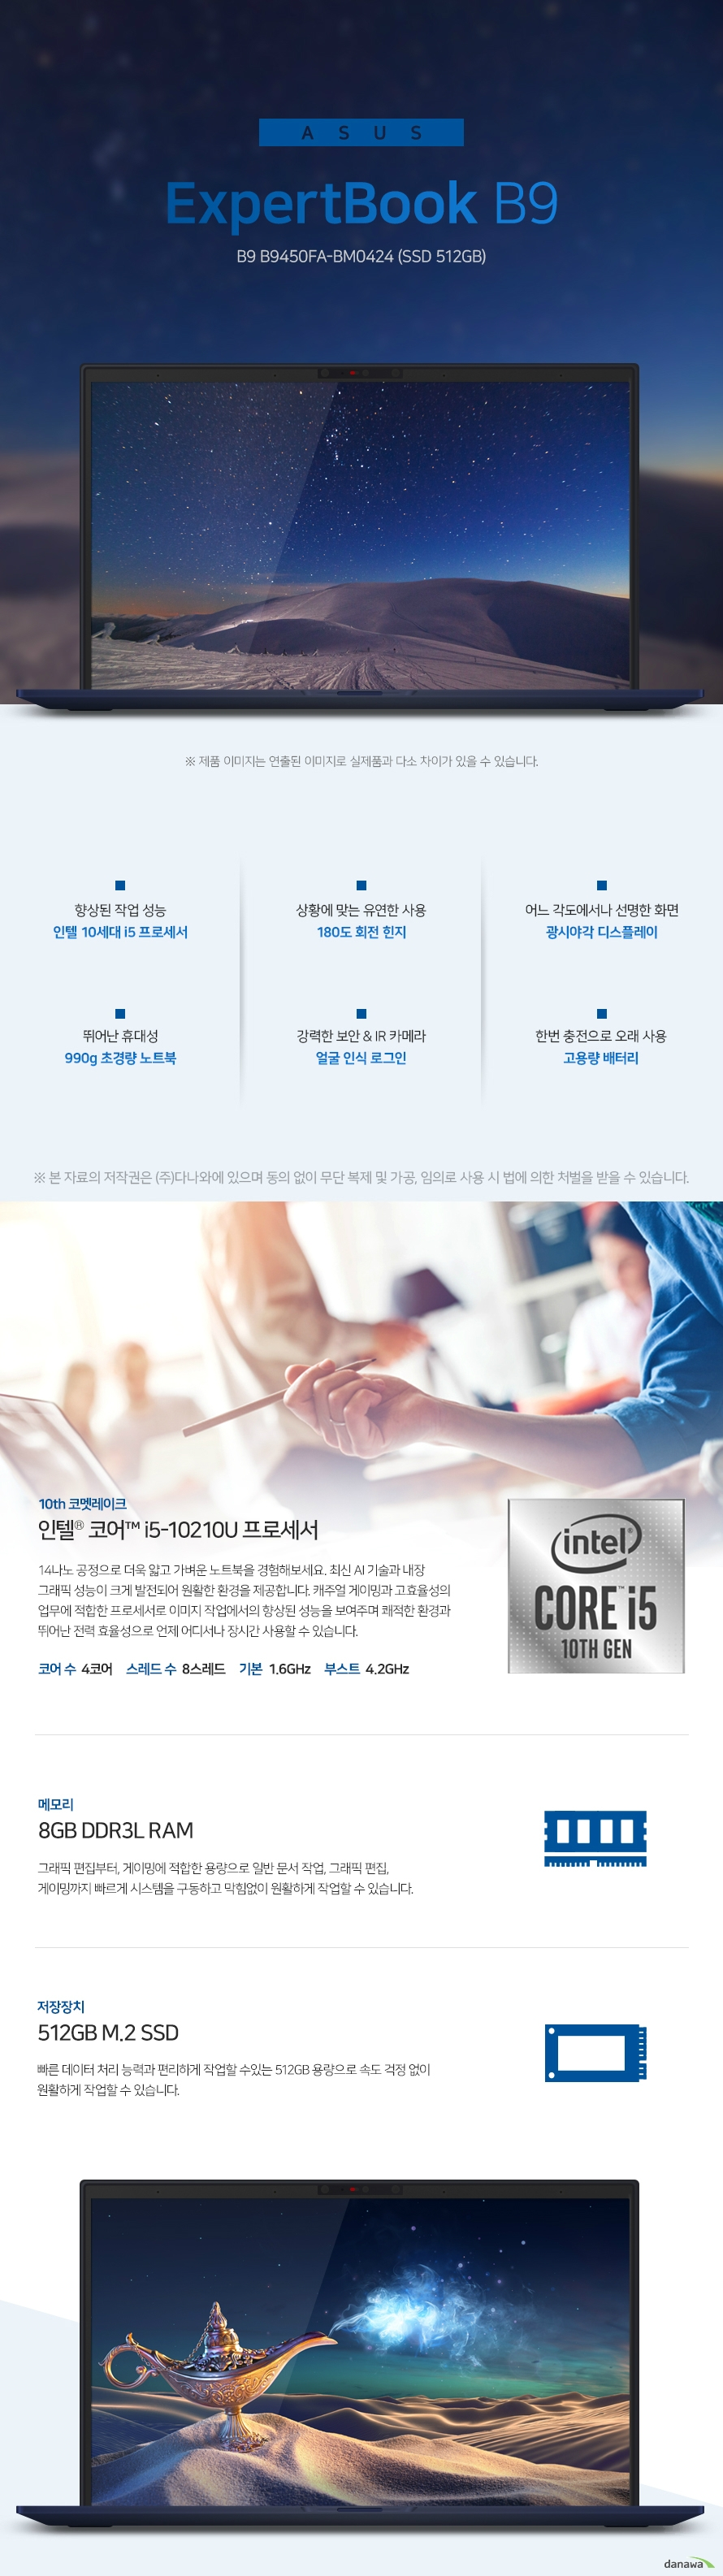 ASUS ExpertBook B9 B9450FA-BM0424 (SSD 512GB)